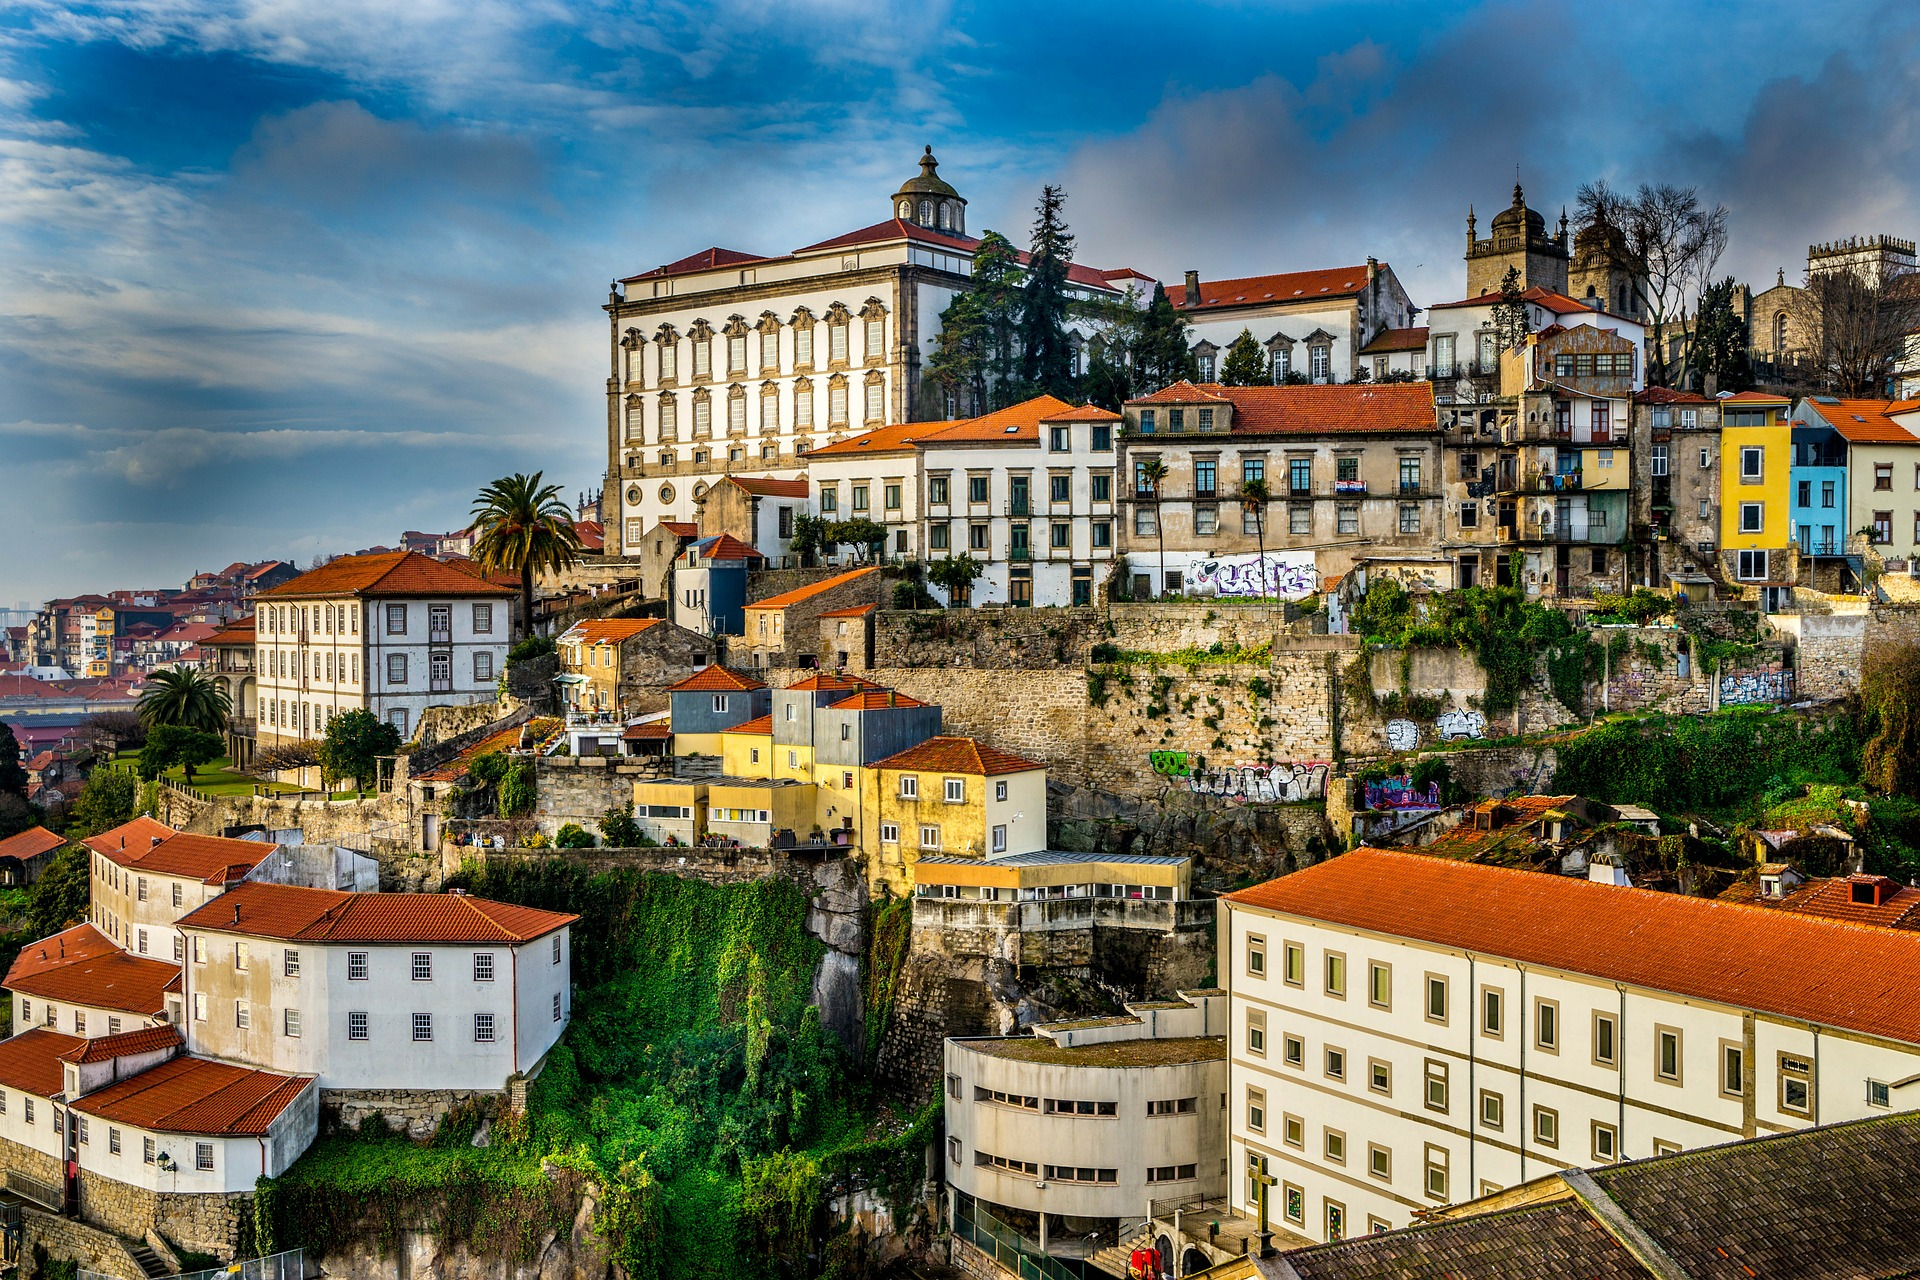 porto-vroegboekkorting portugal vakantie met extra veel voordeel